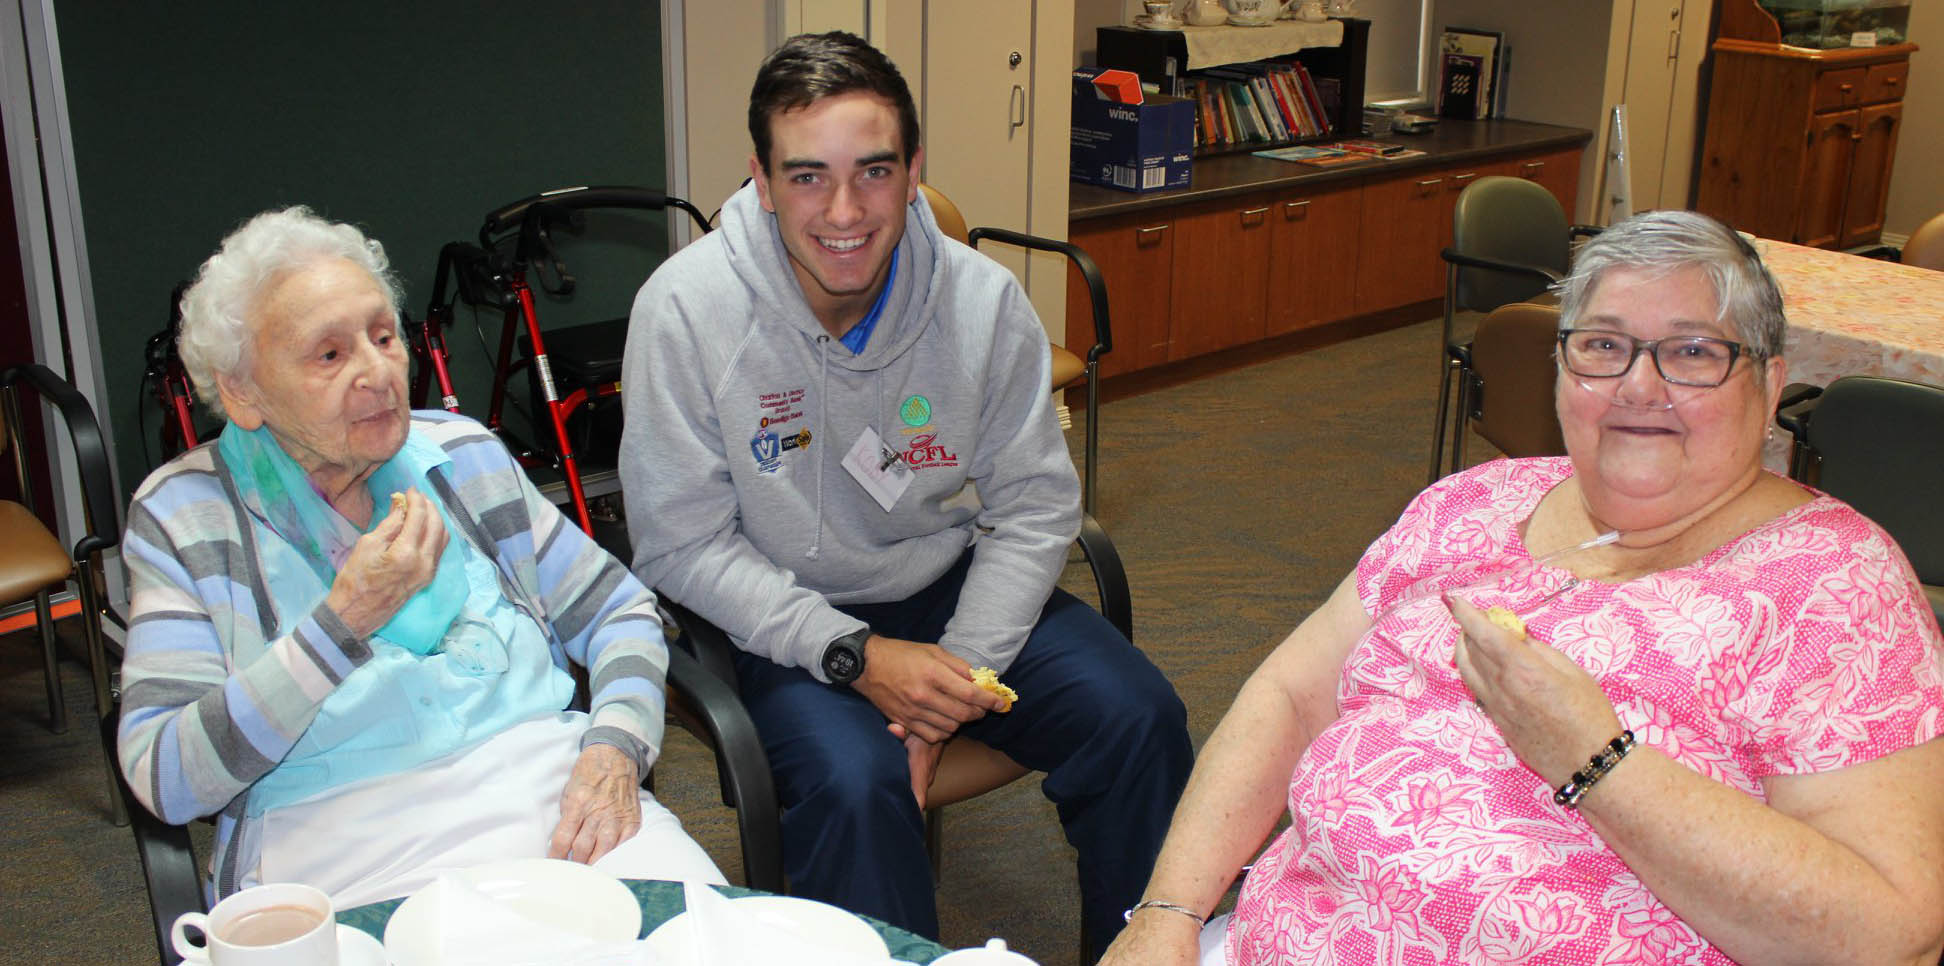 Youth leadership program participant talking to elders at nursing home.